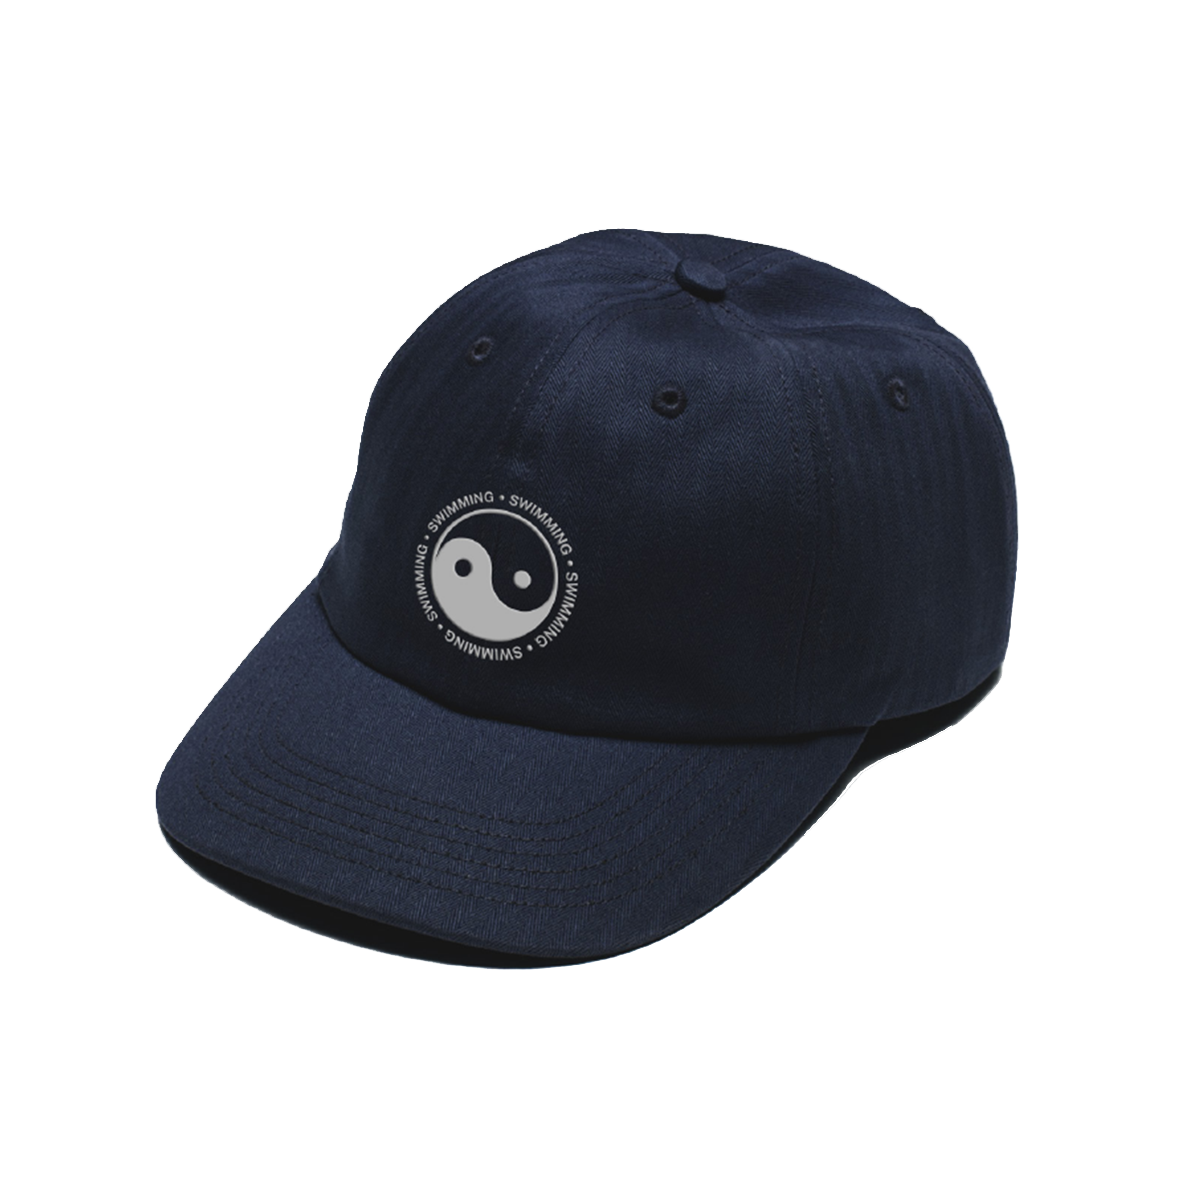 Yin Yang Hat Hats For Men Dad Hats Mac Miller